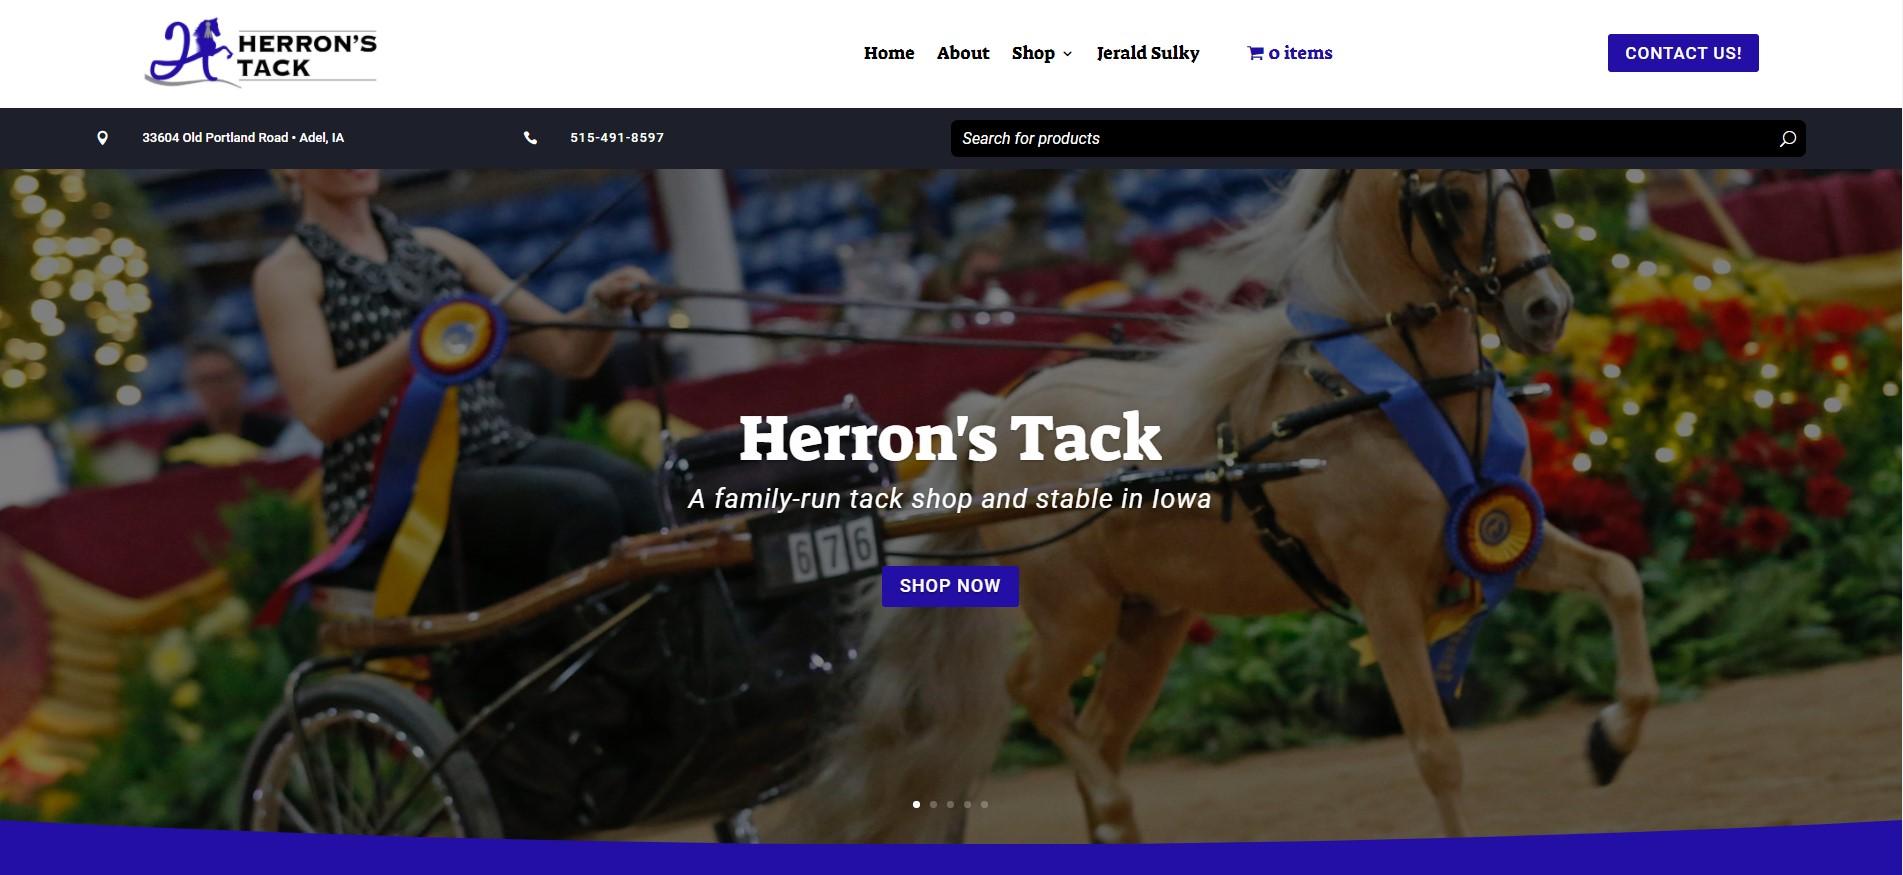 Herron's Tack